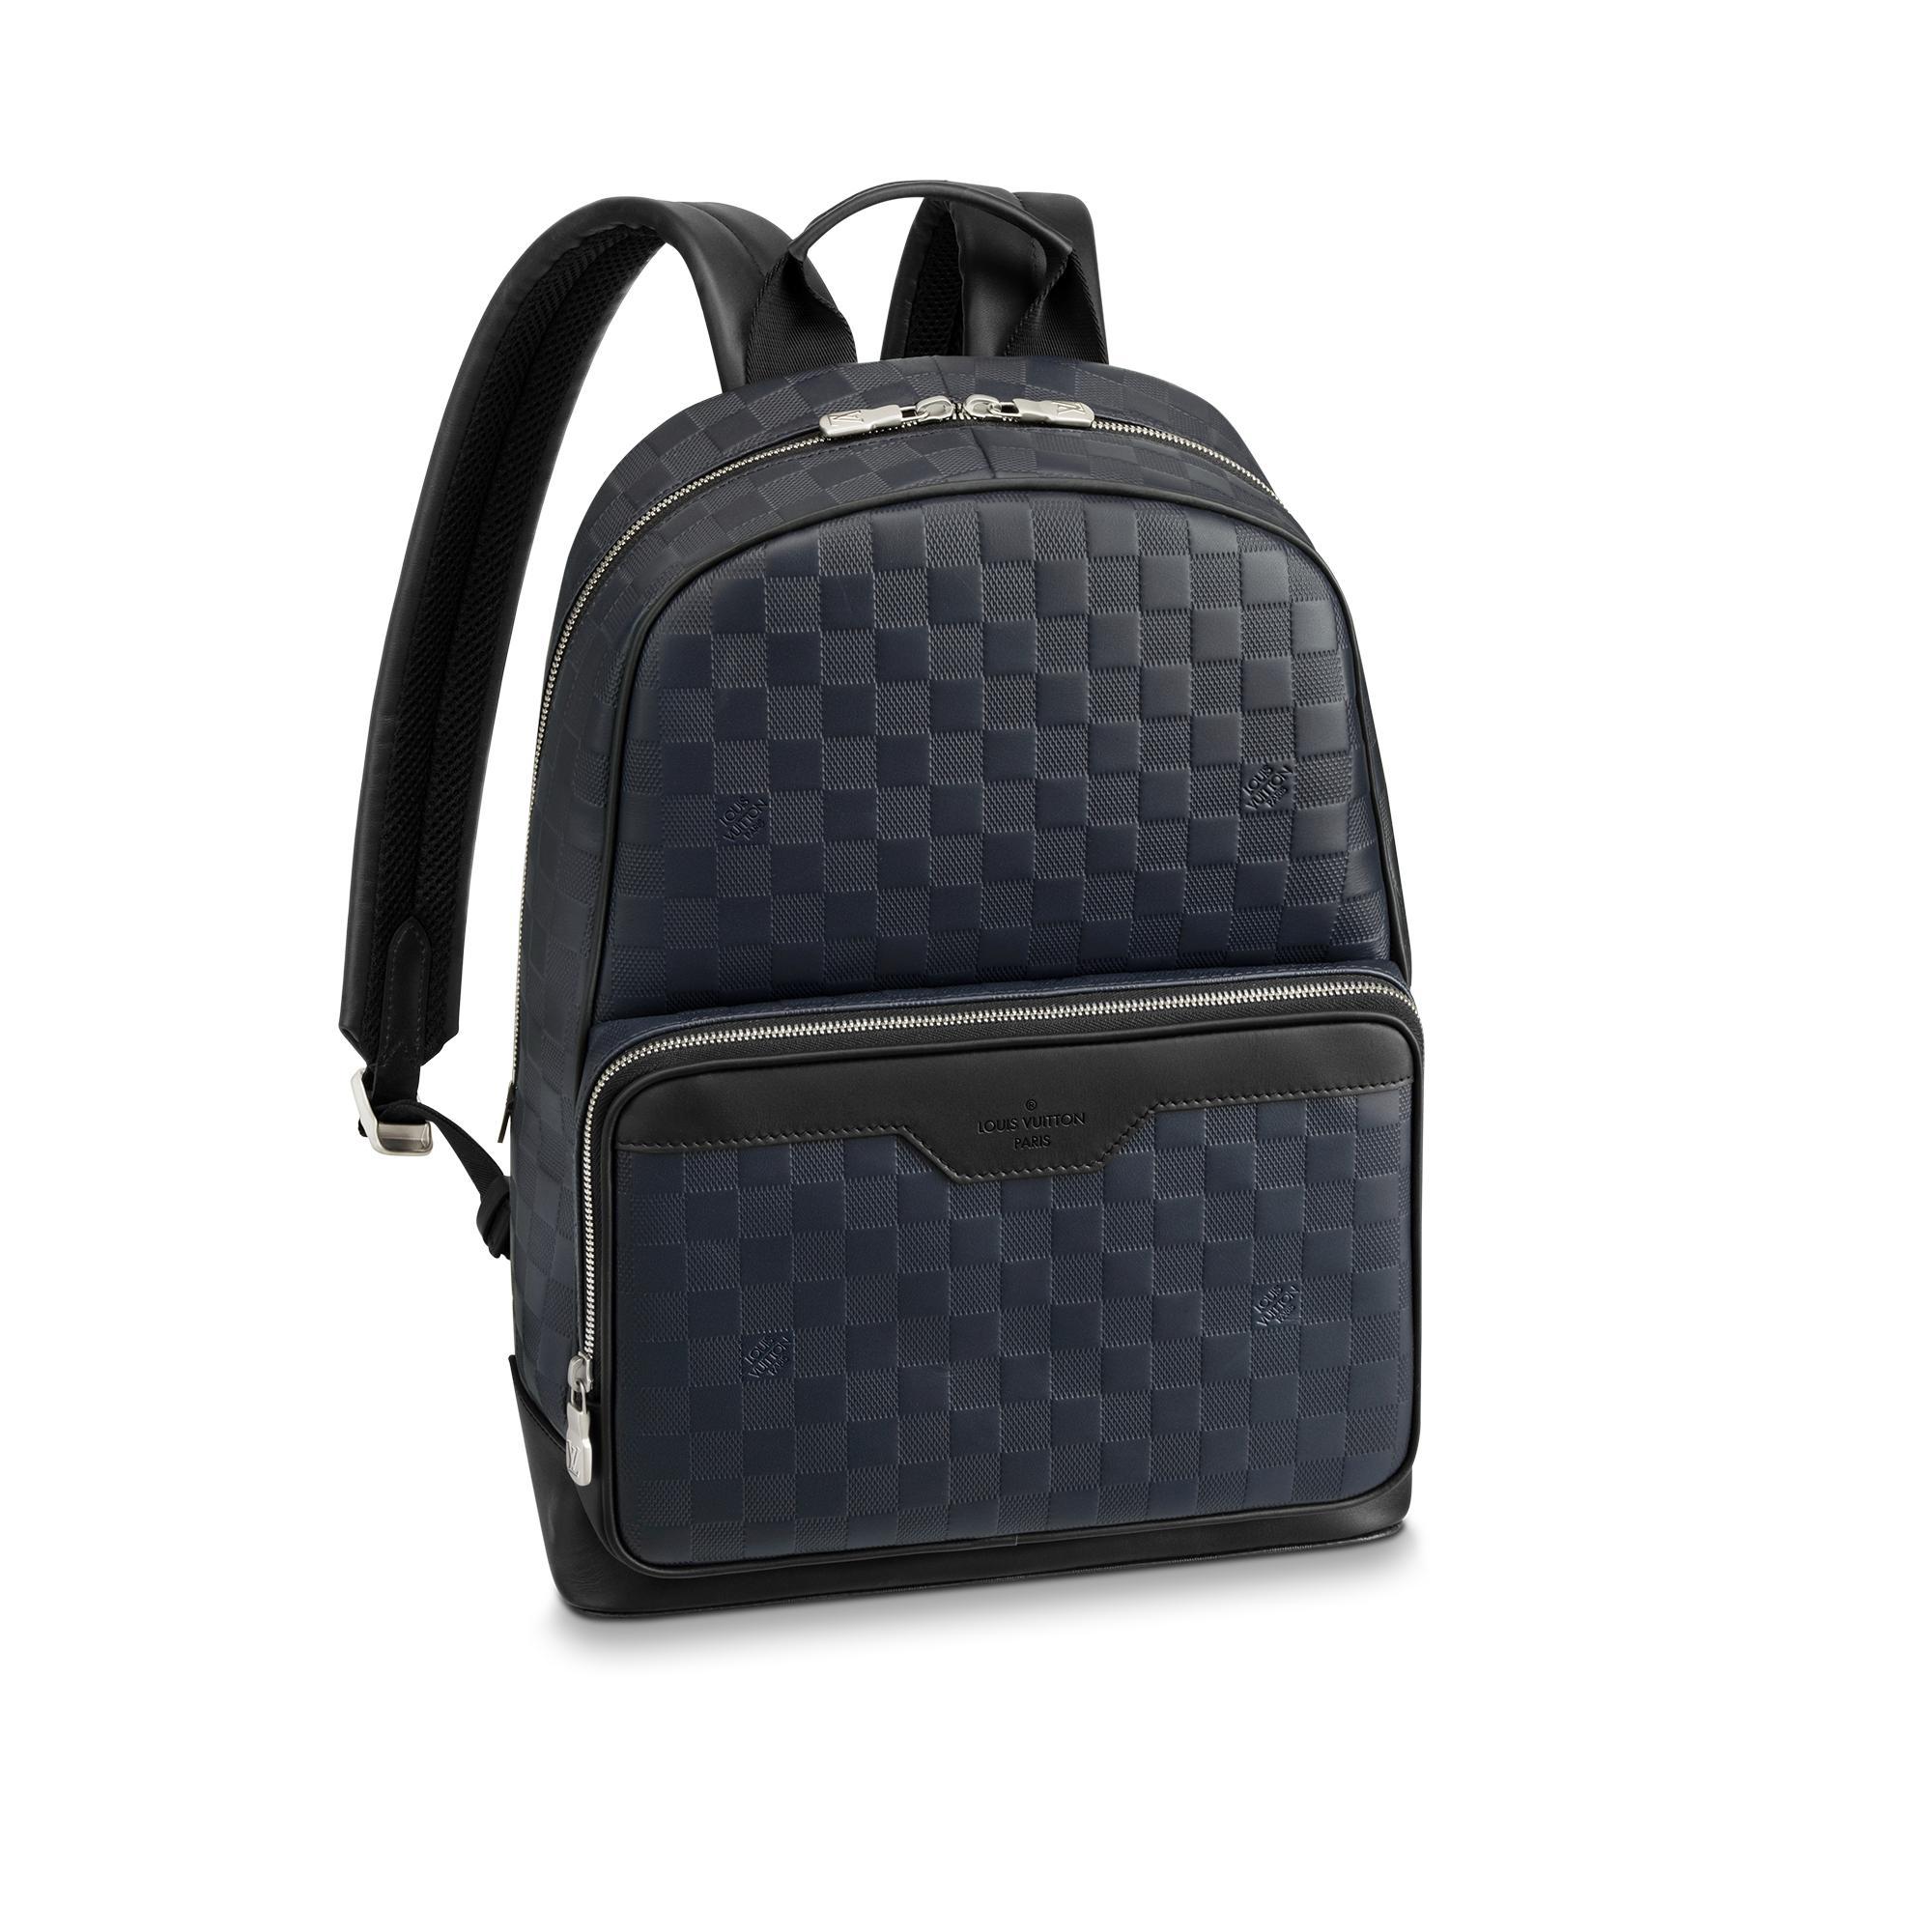 9b5d220810ce Louis Vuitton Campus Backpack